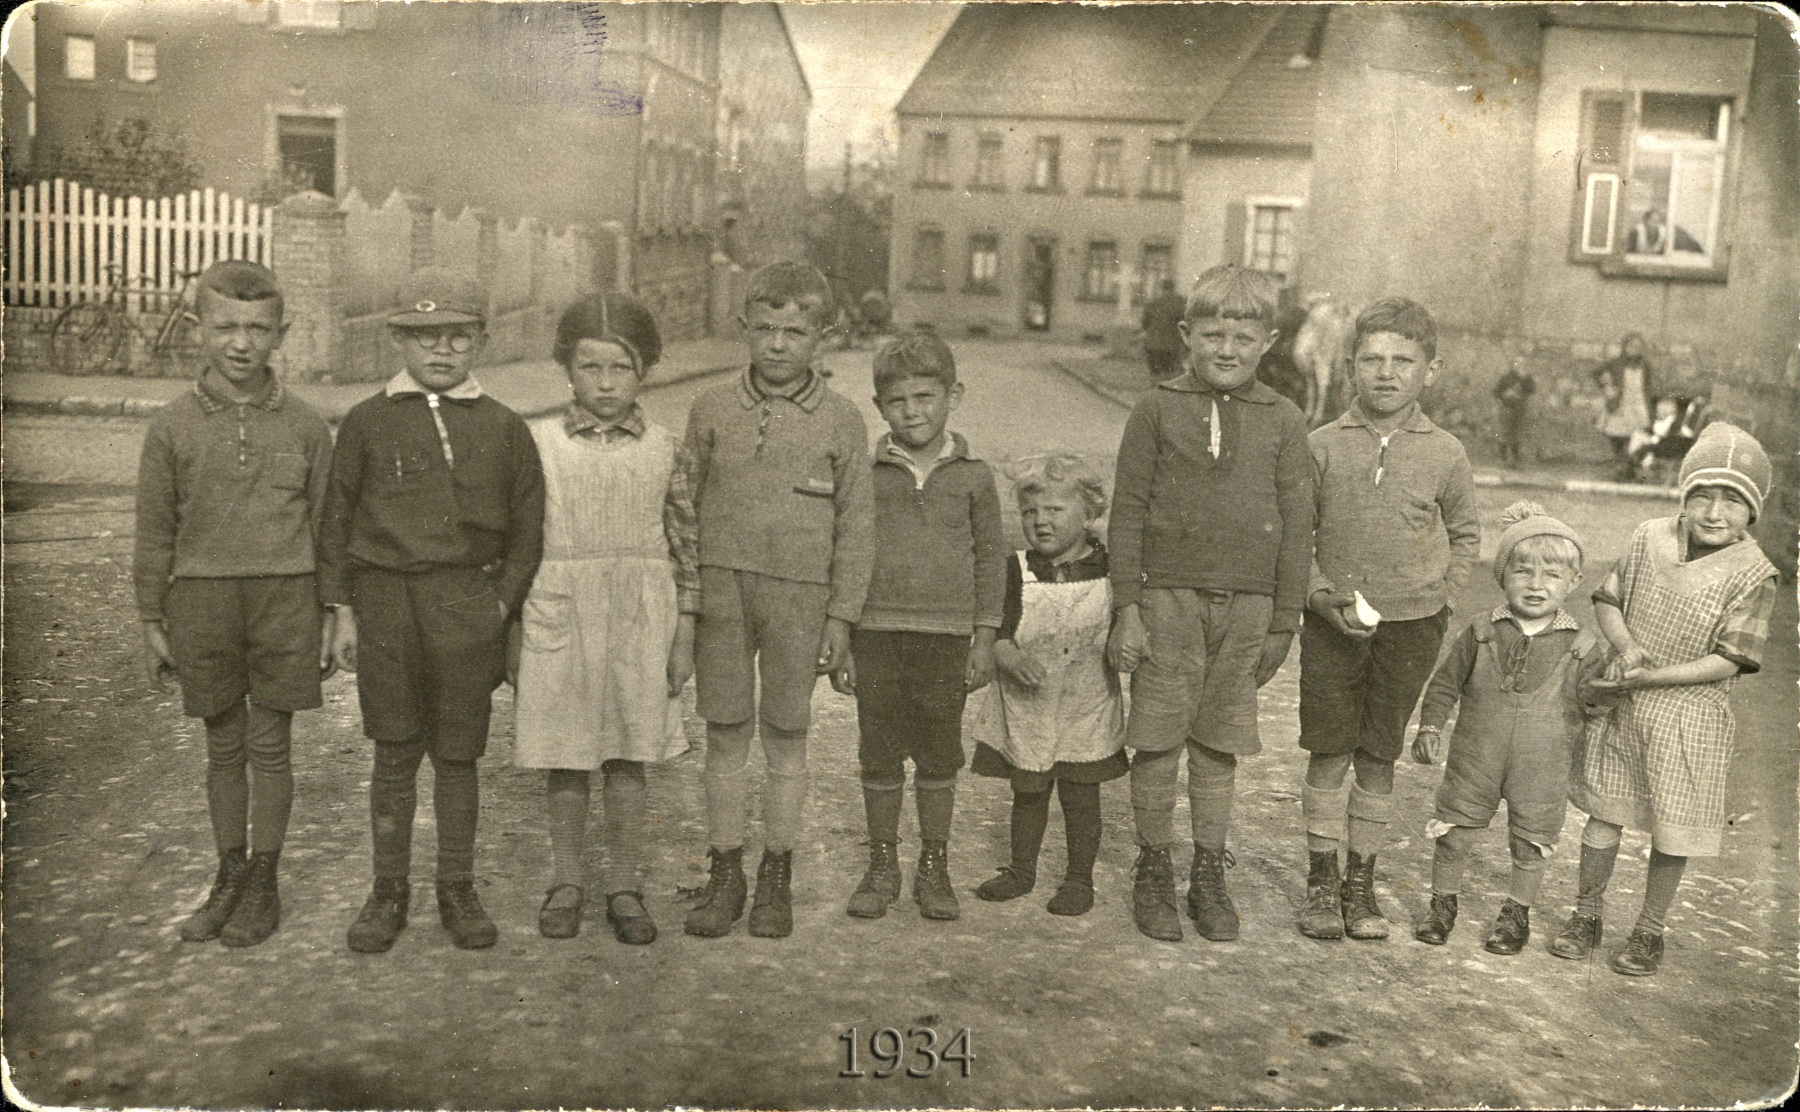 Kinder 1934 Fabrikstraße/Ludwigstraße